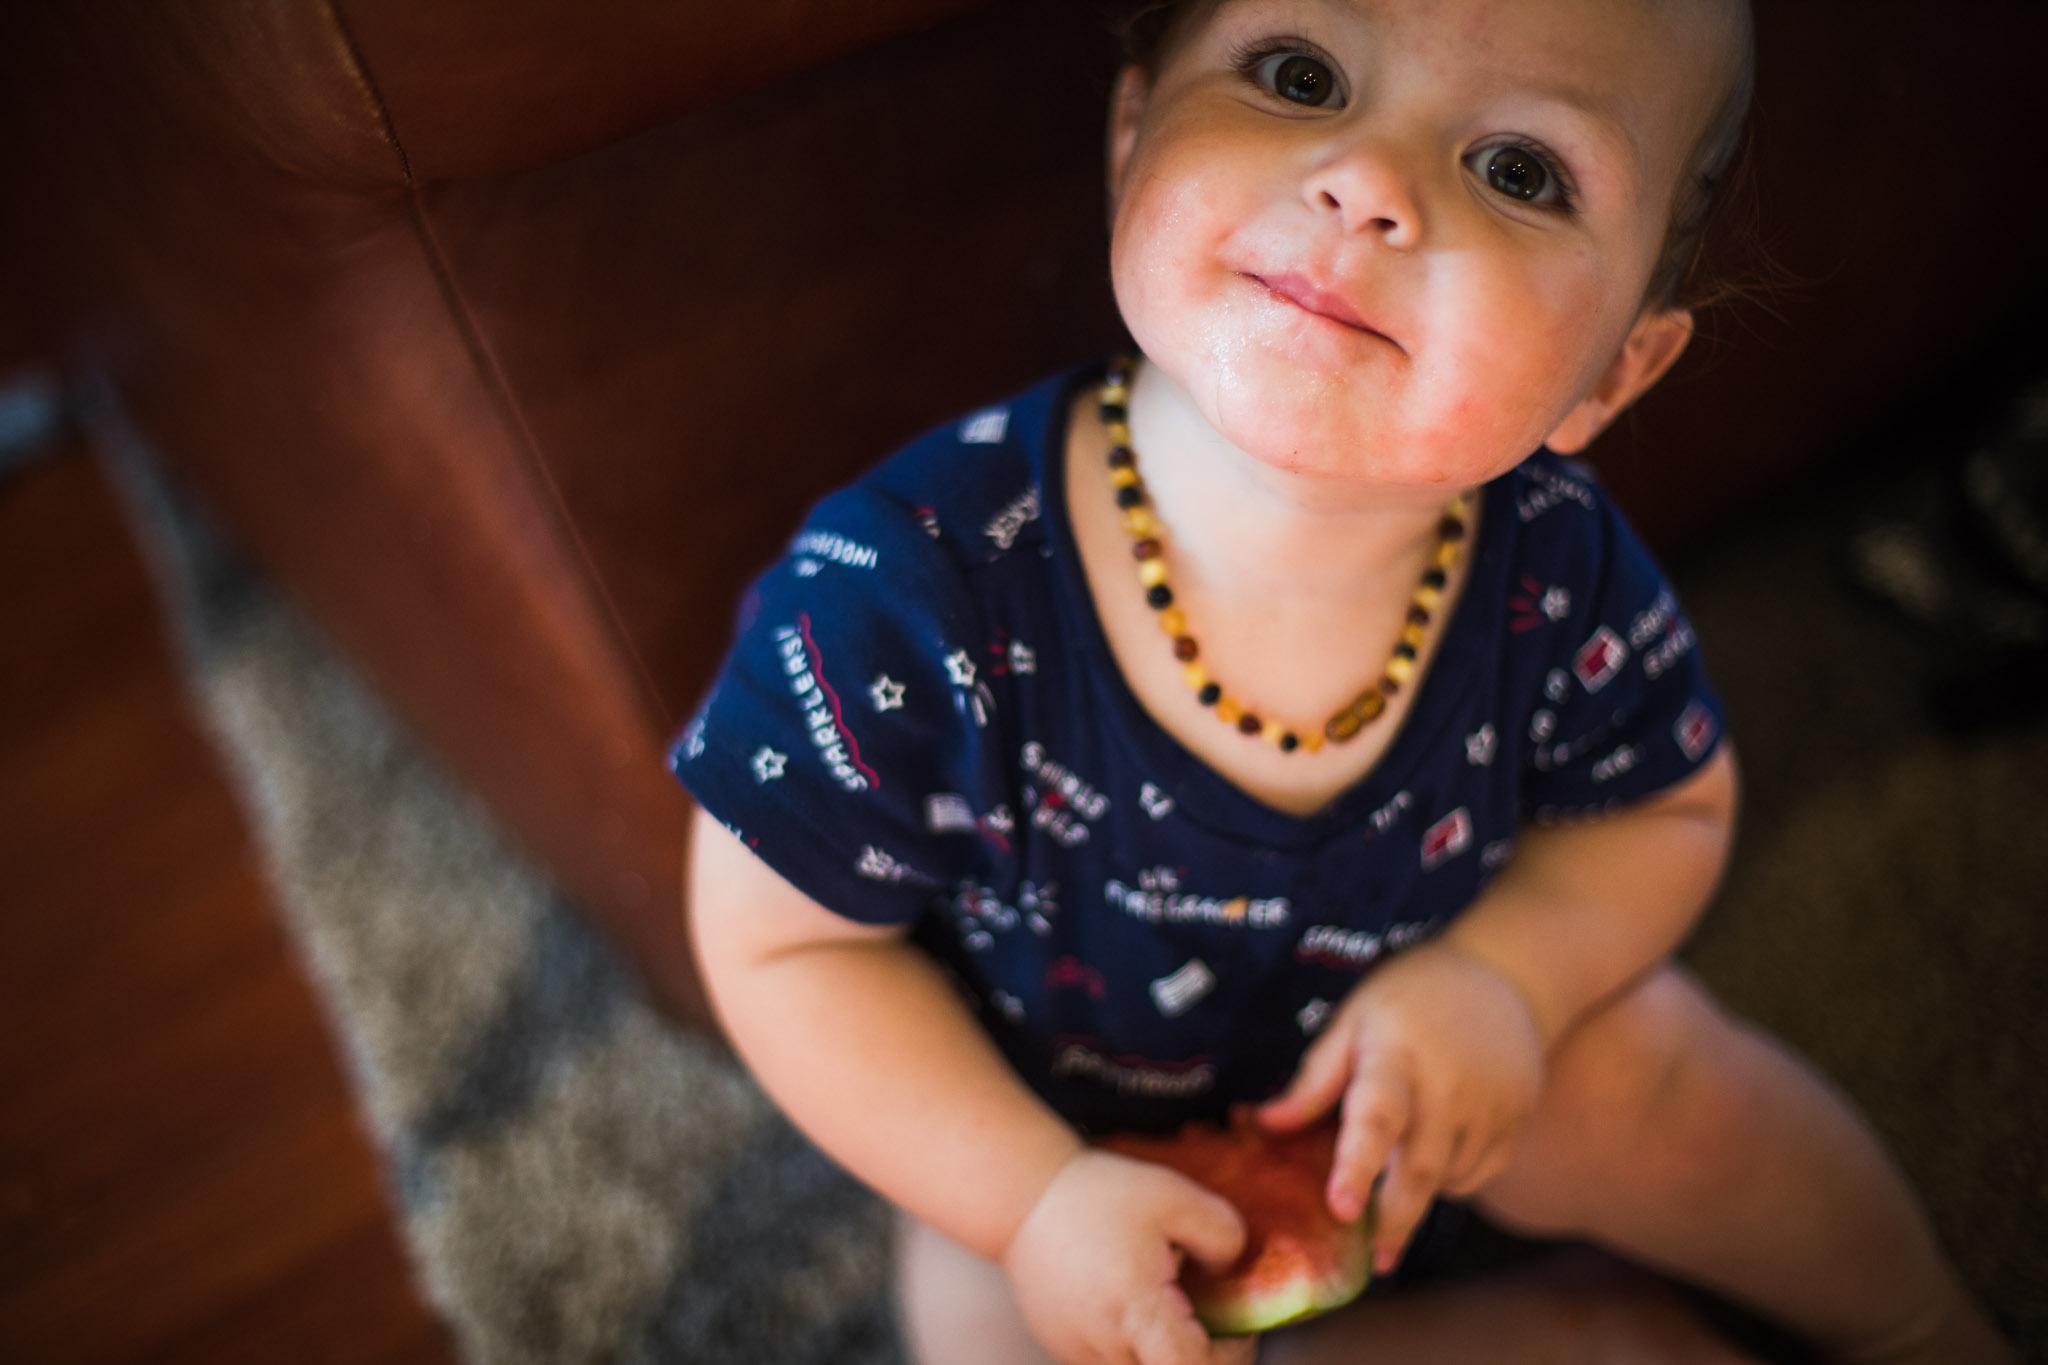 Archer_Inspired_Photography_Watermelon_Baby_Boy_Eating_Lifestyle_Photographer_California-27.jpg